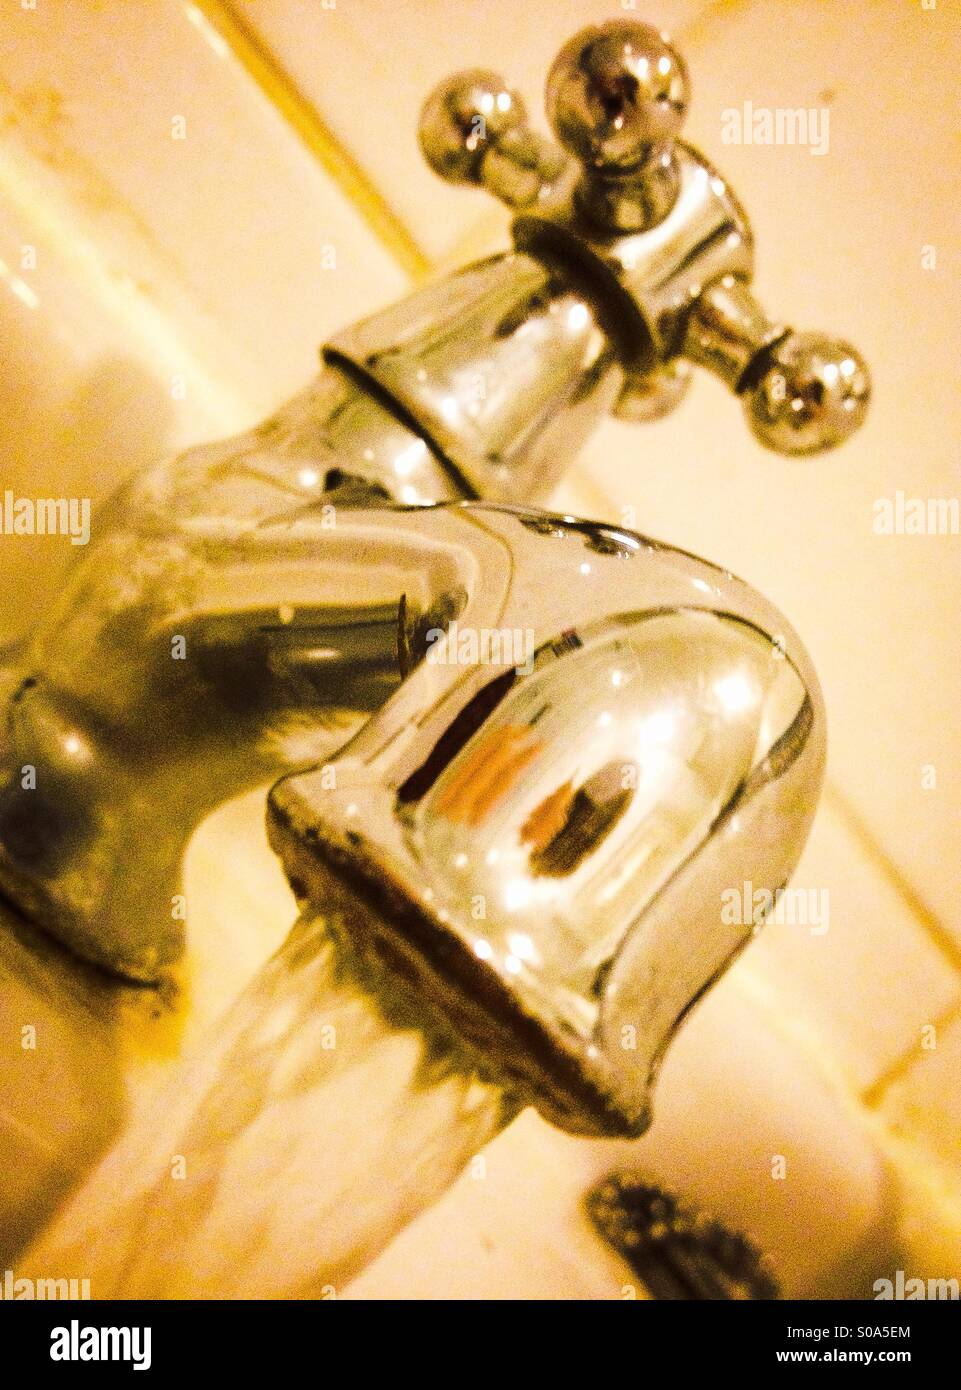 Running water tap - Stock Image